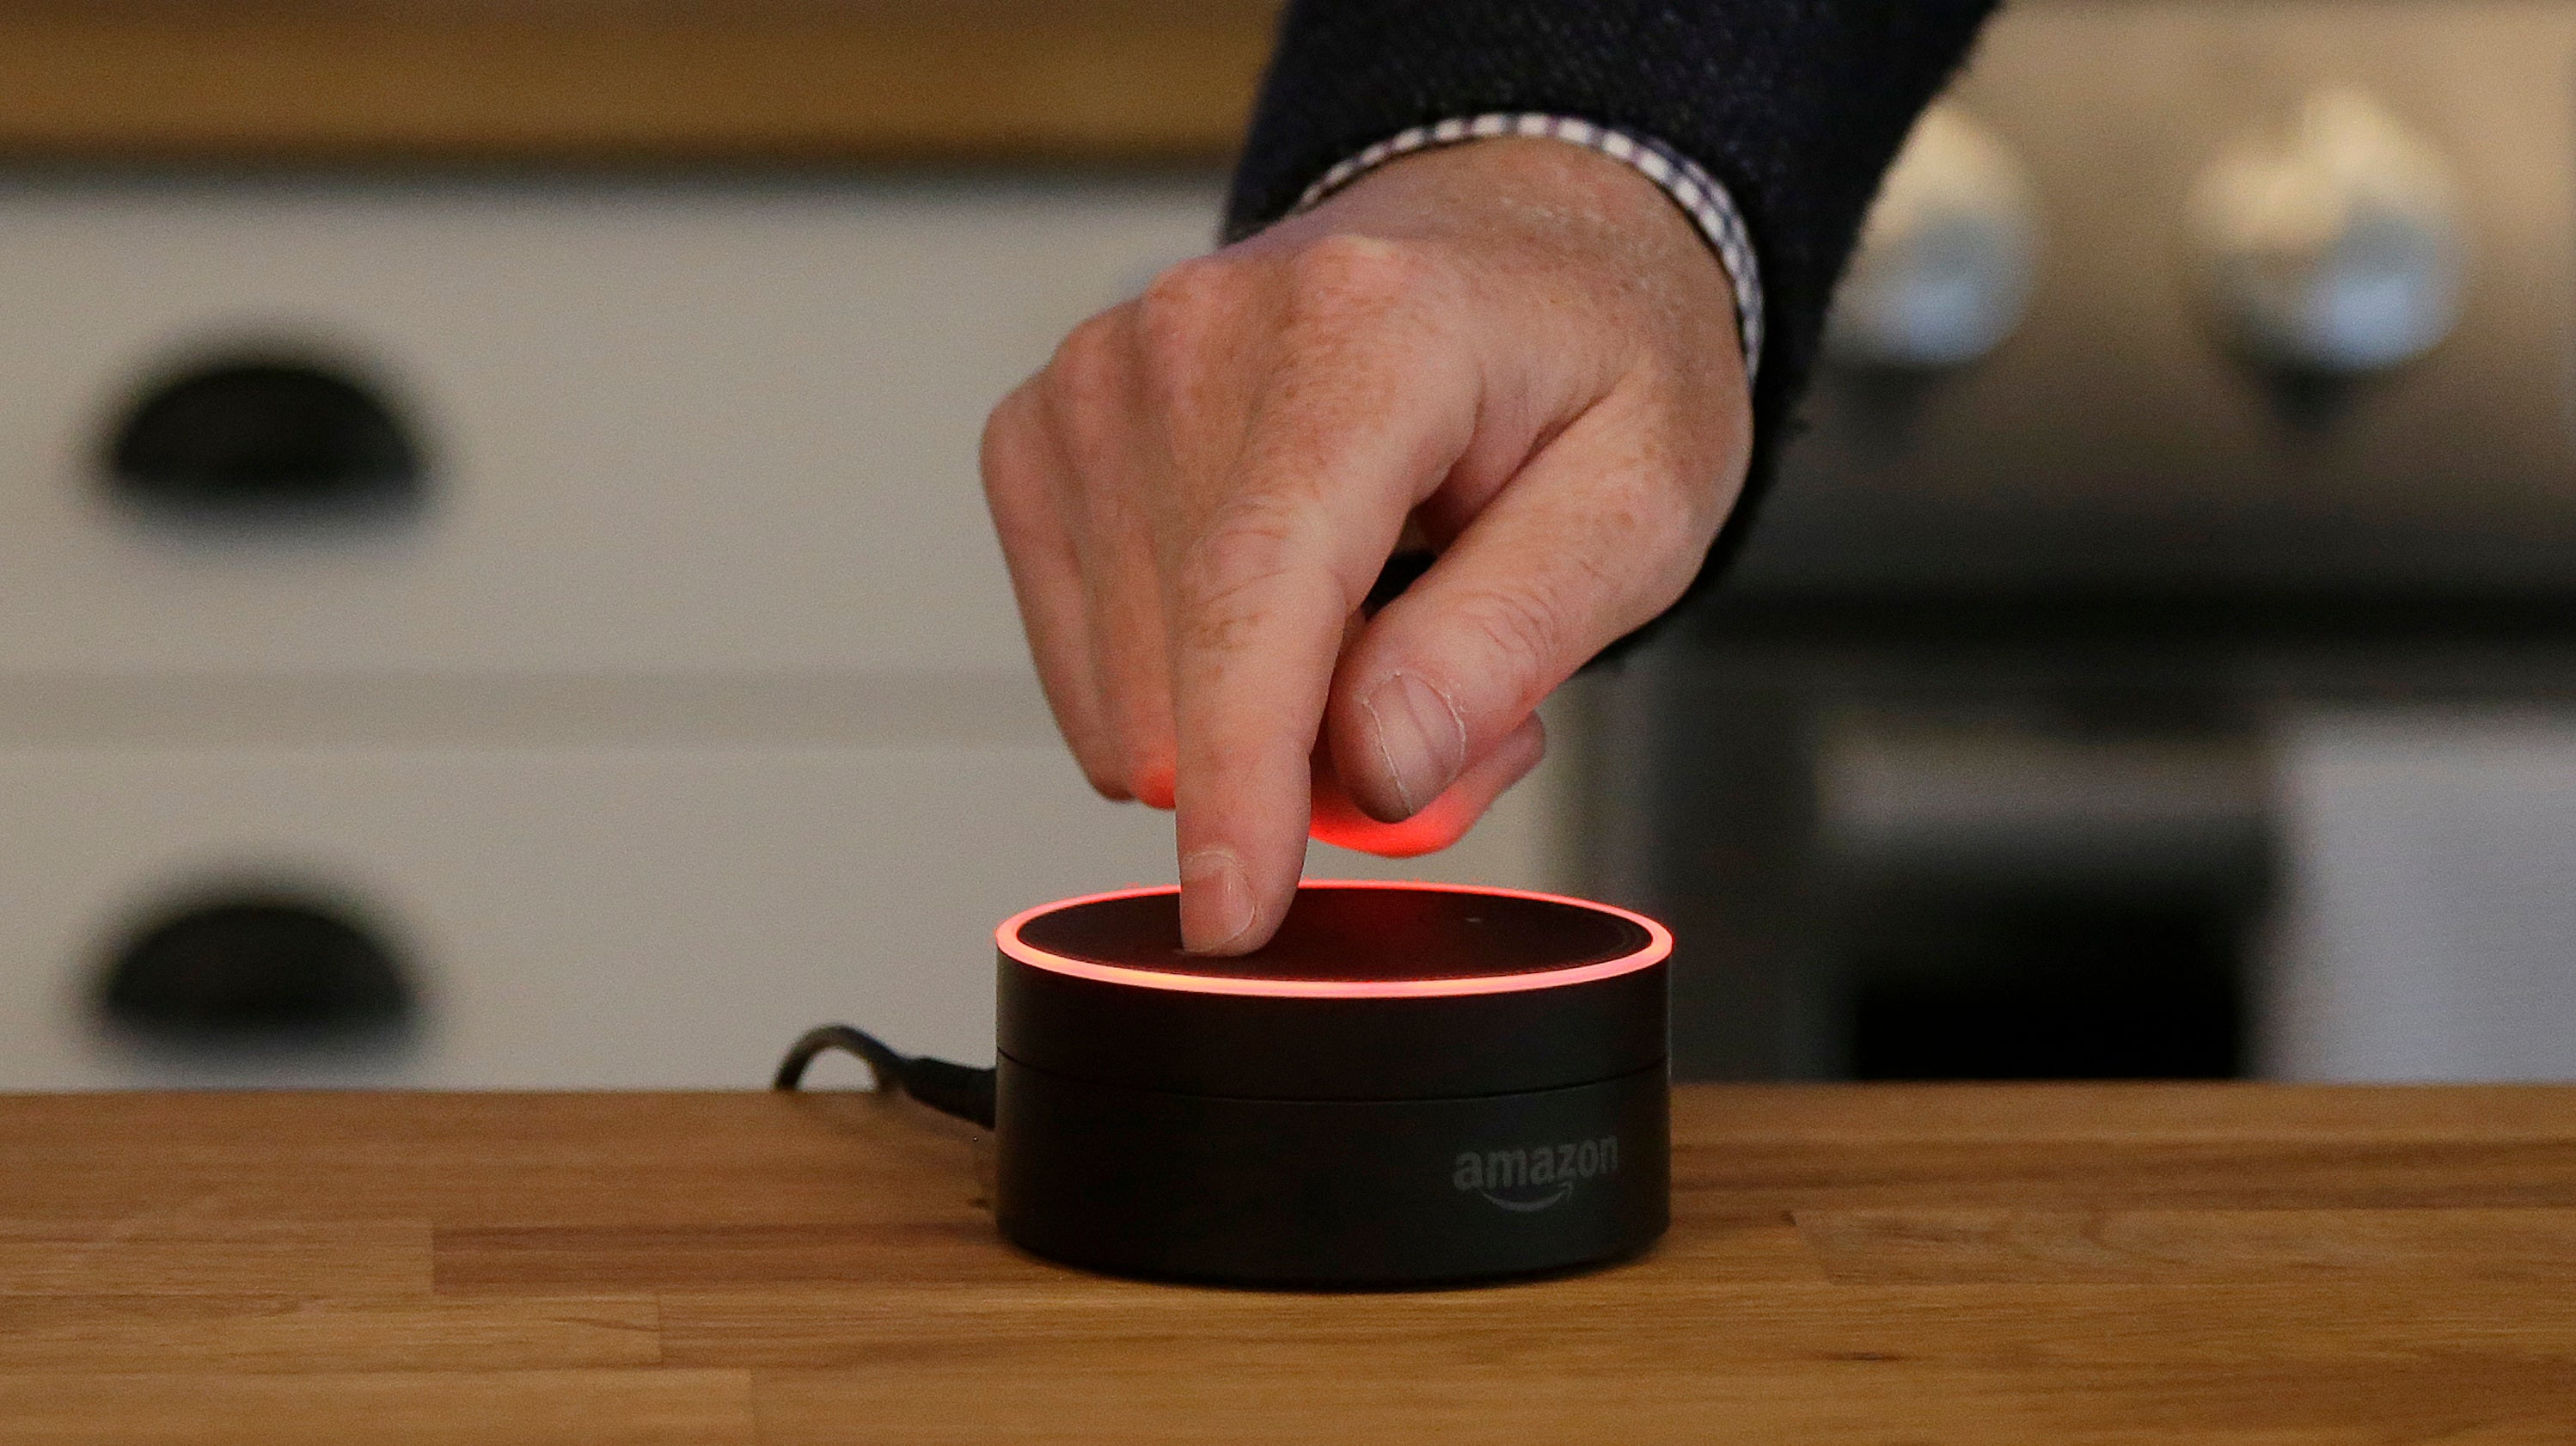 Report: Almost Nobody Is Using Amazon's Alexa To Actually Buy Stuff